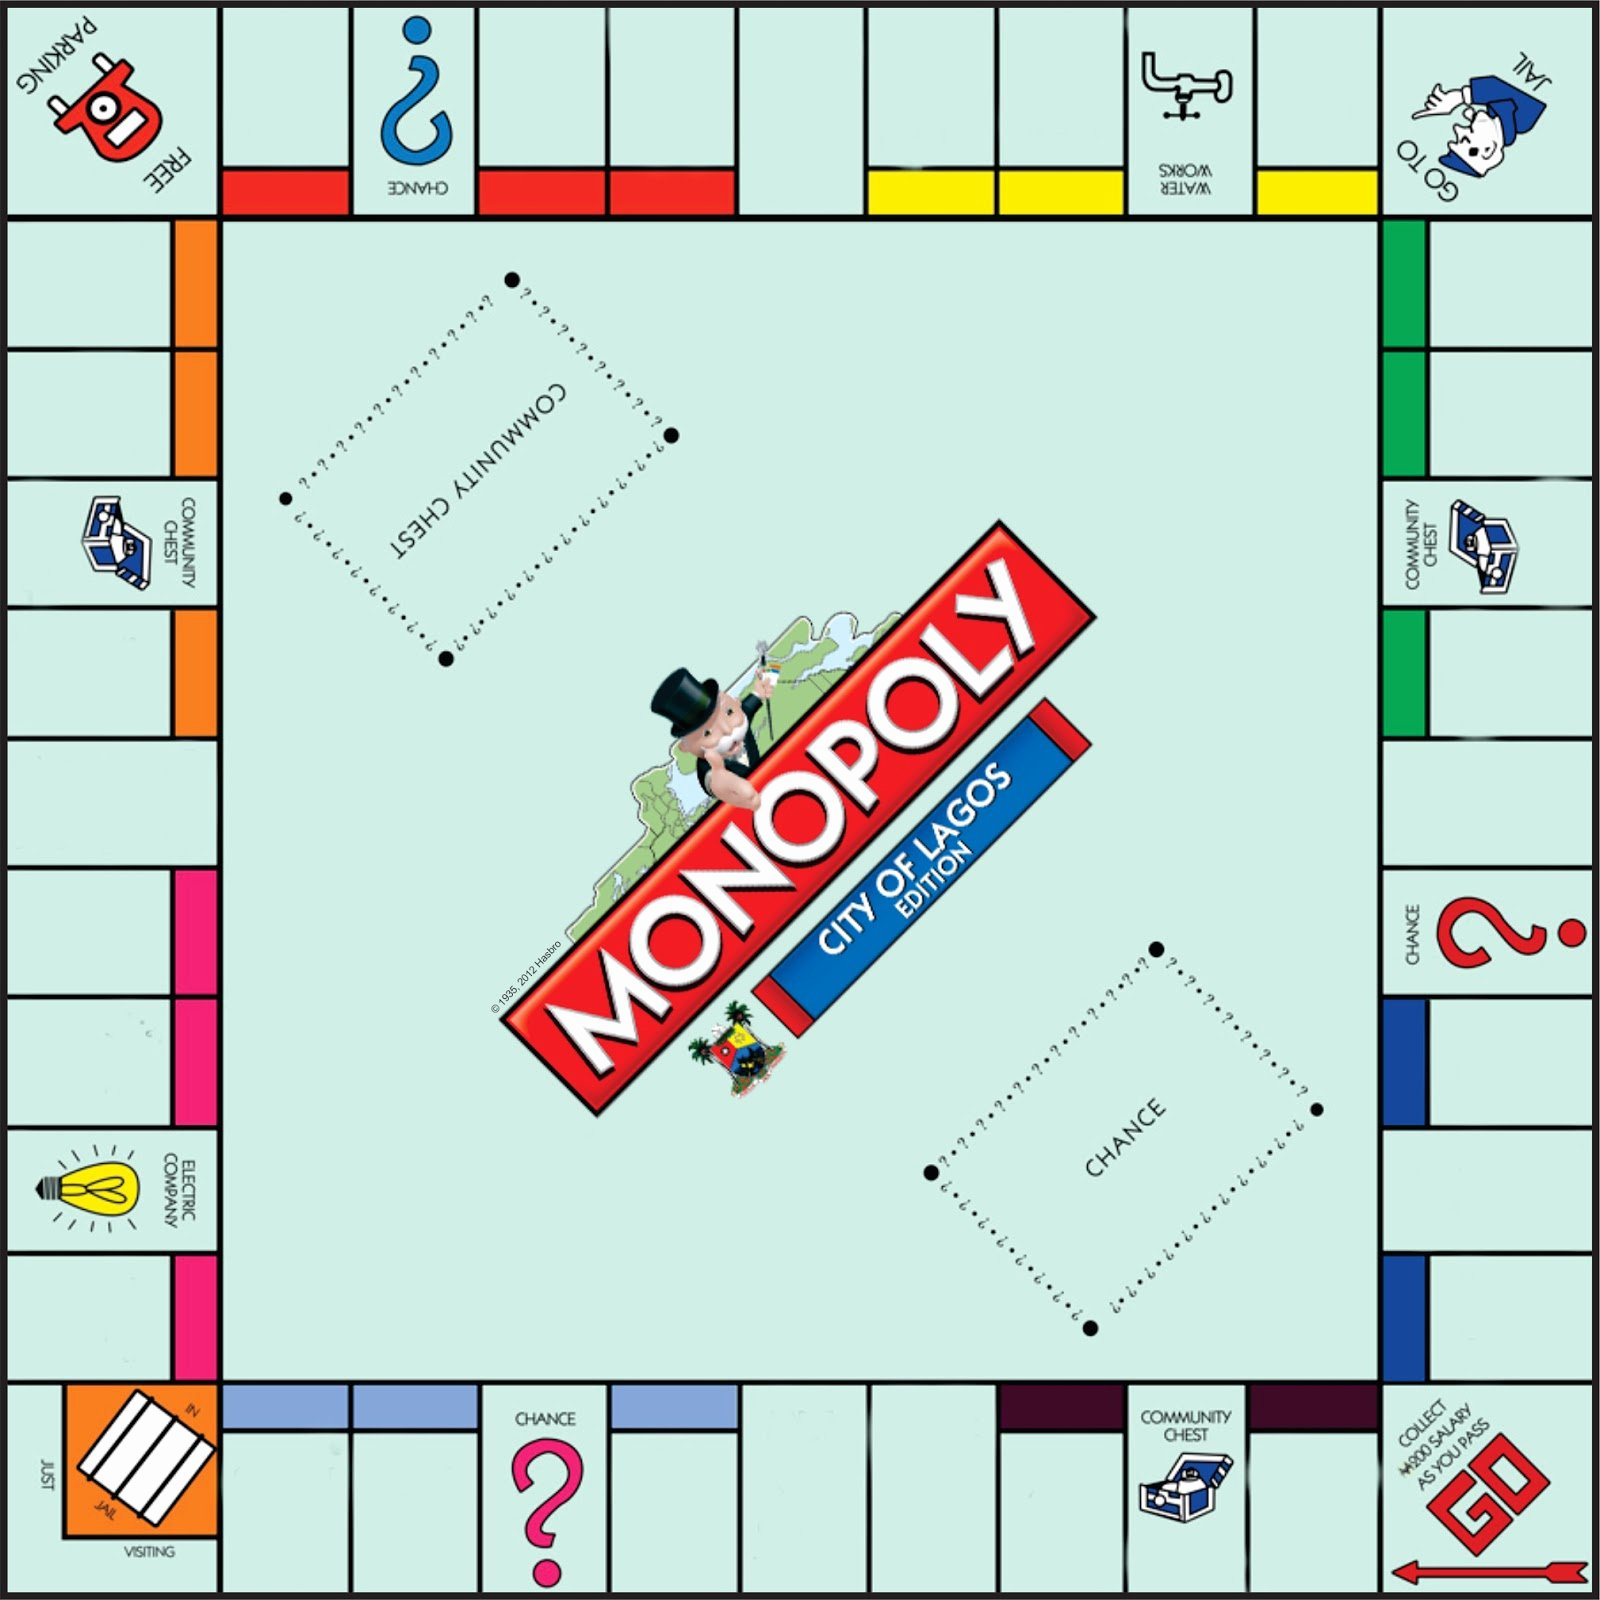 Monopoly Board Printable Best Of Printable Monopoly Board Game Template Printable Pages